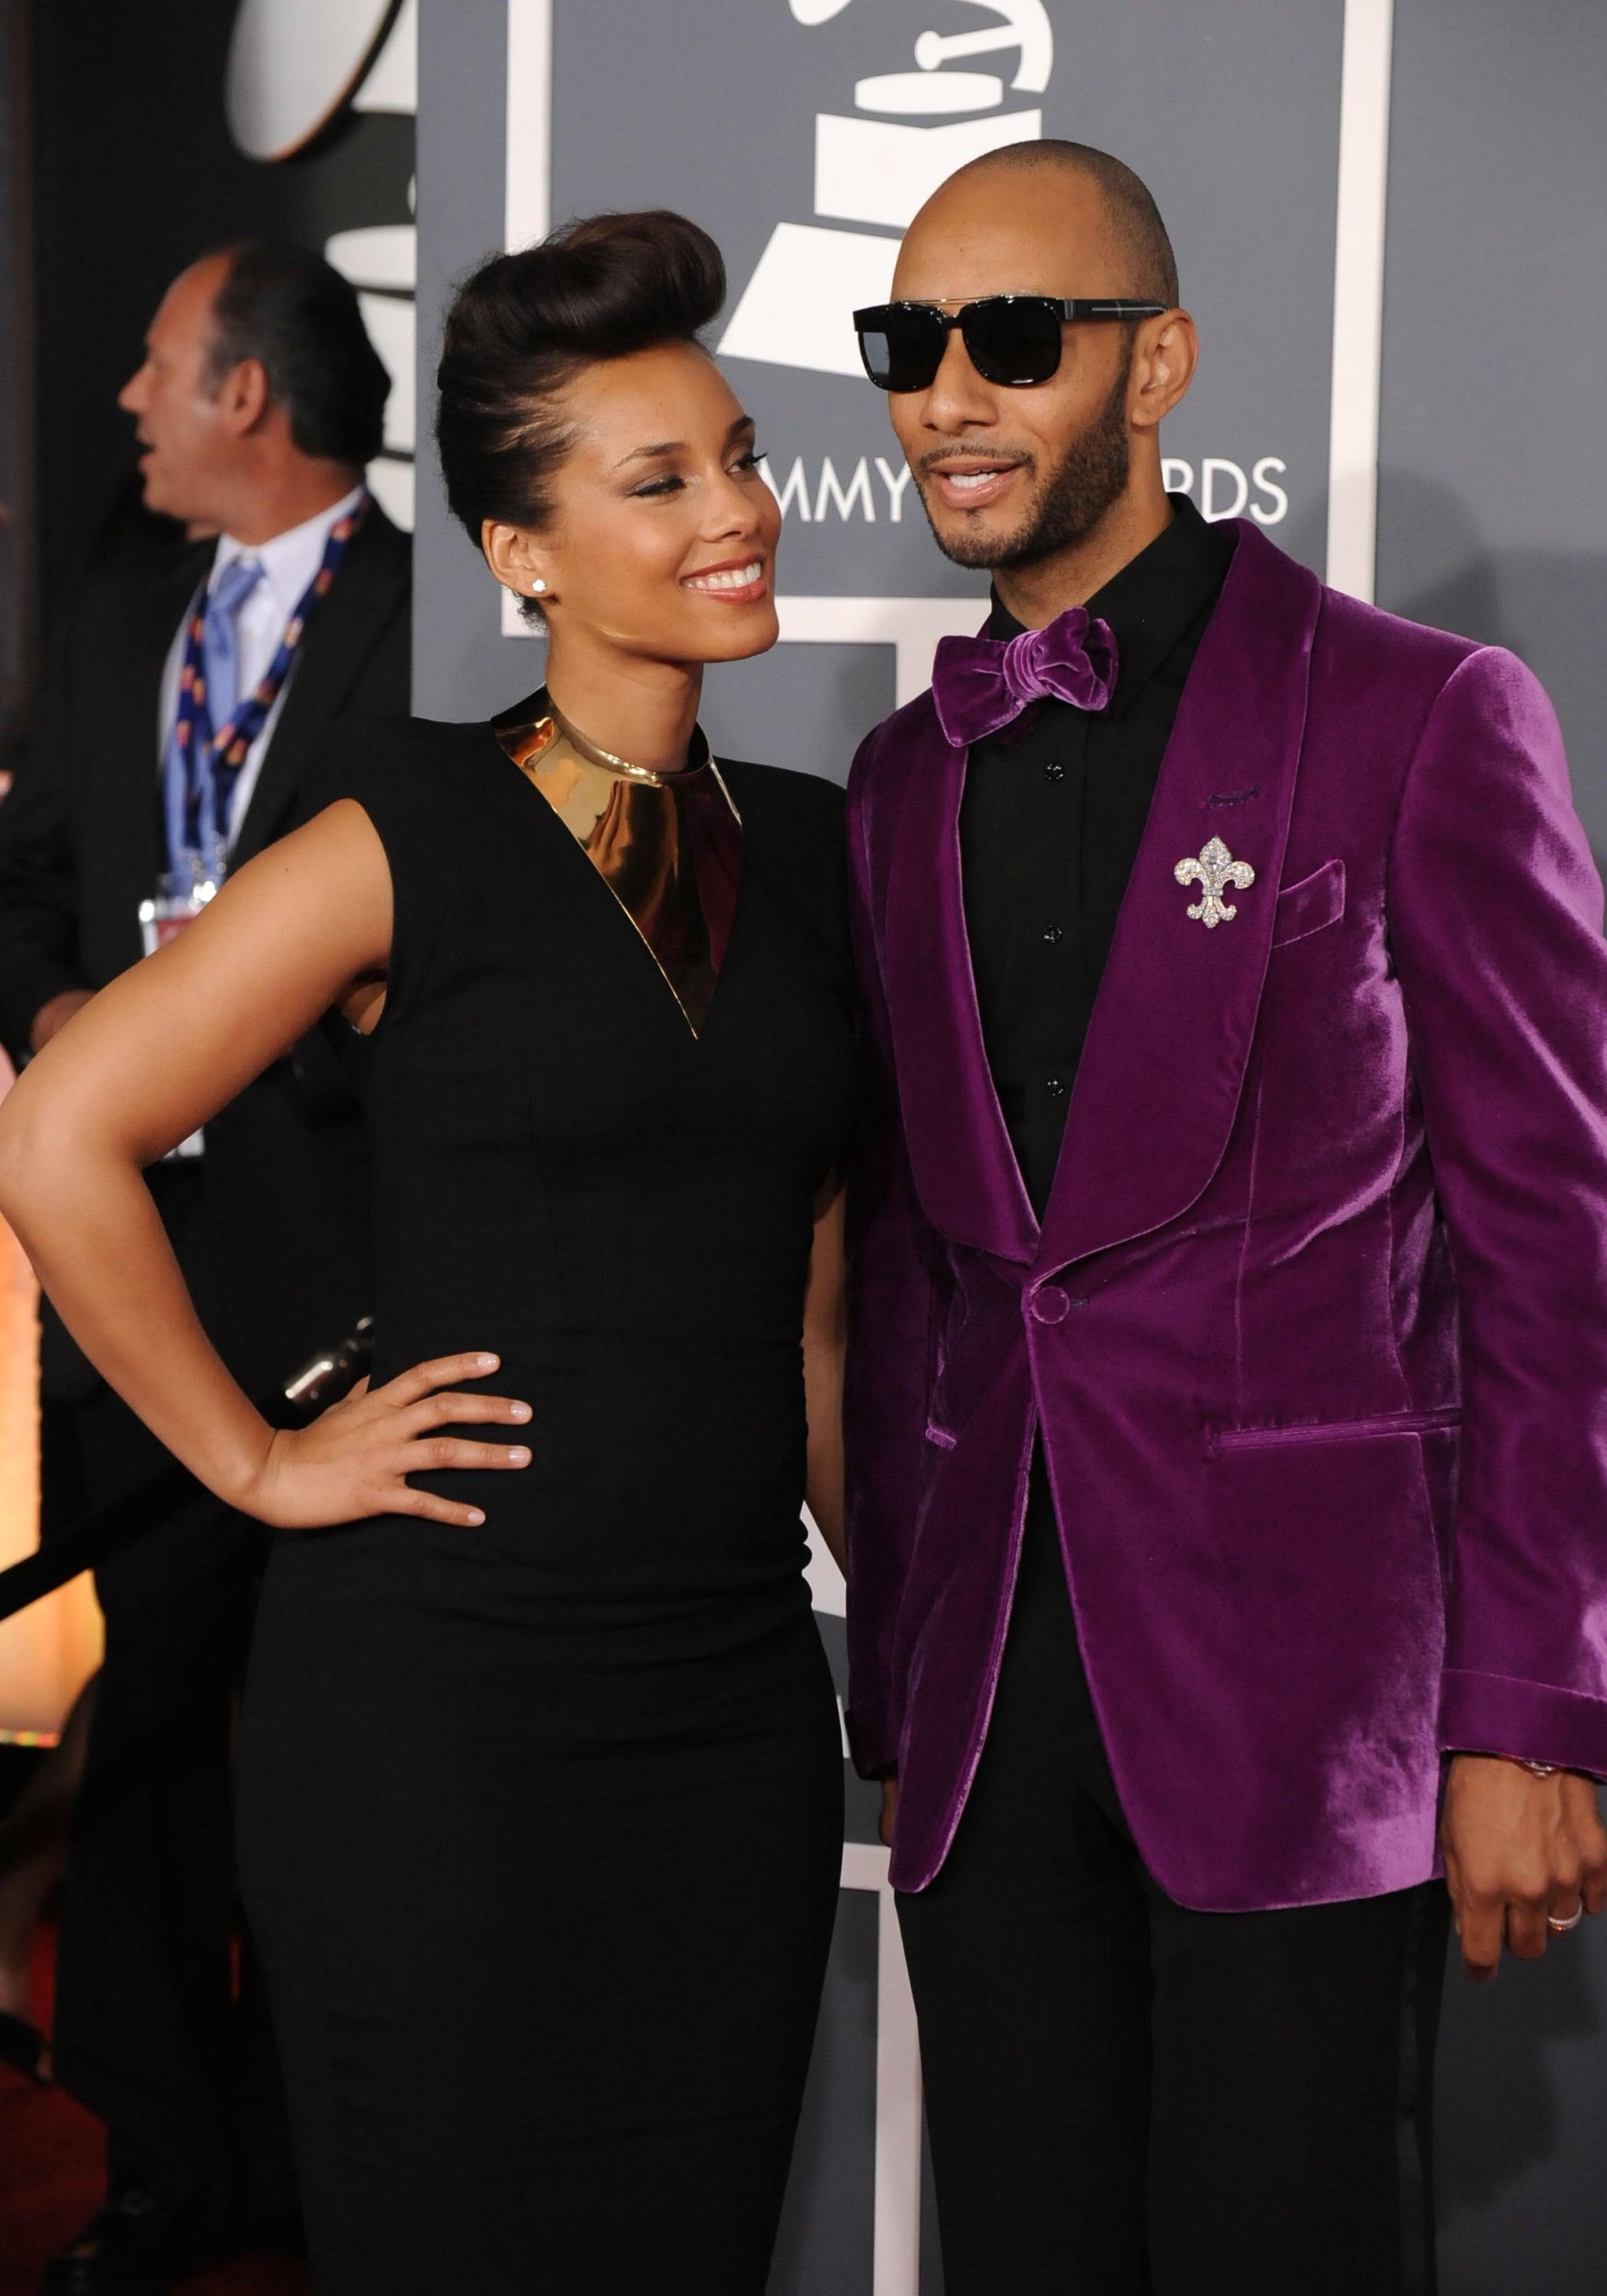 Image result for Alicia Keys and Swizz Beatz Secret wedding